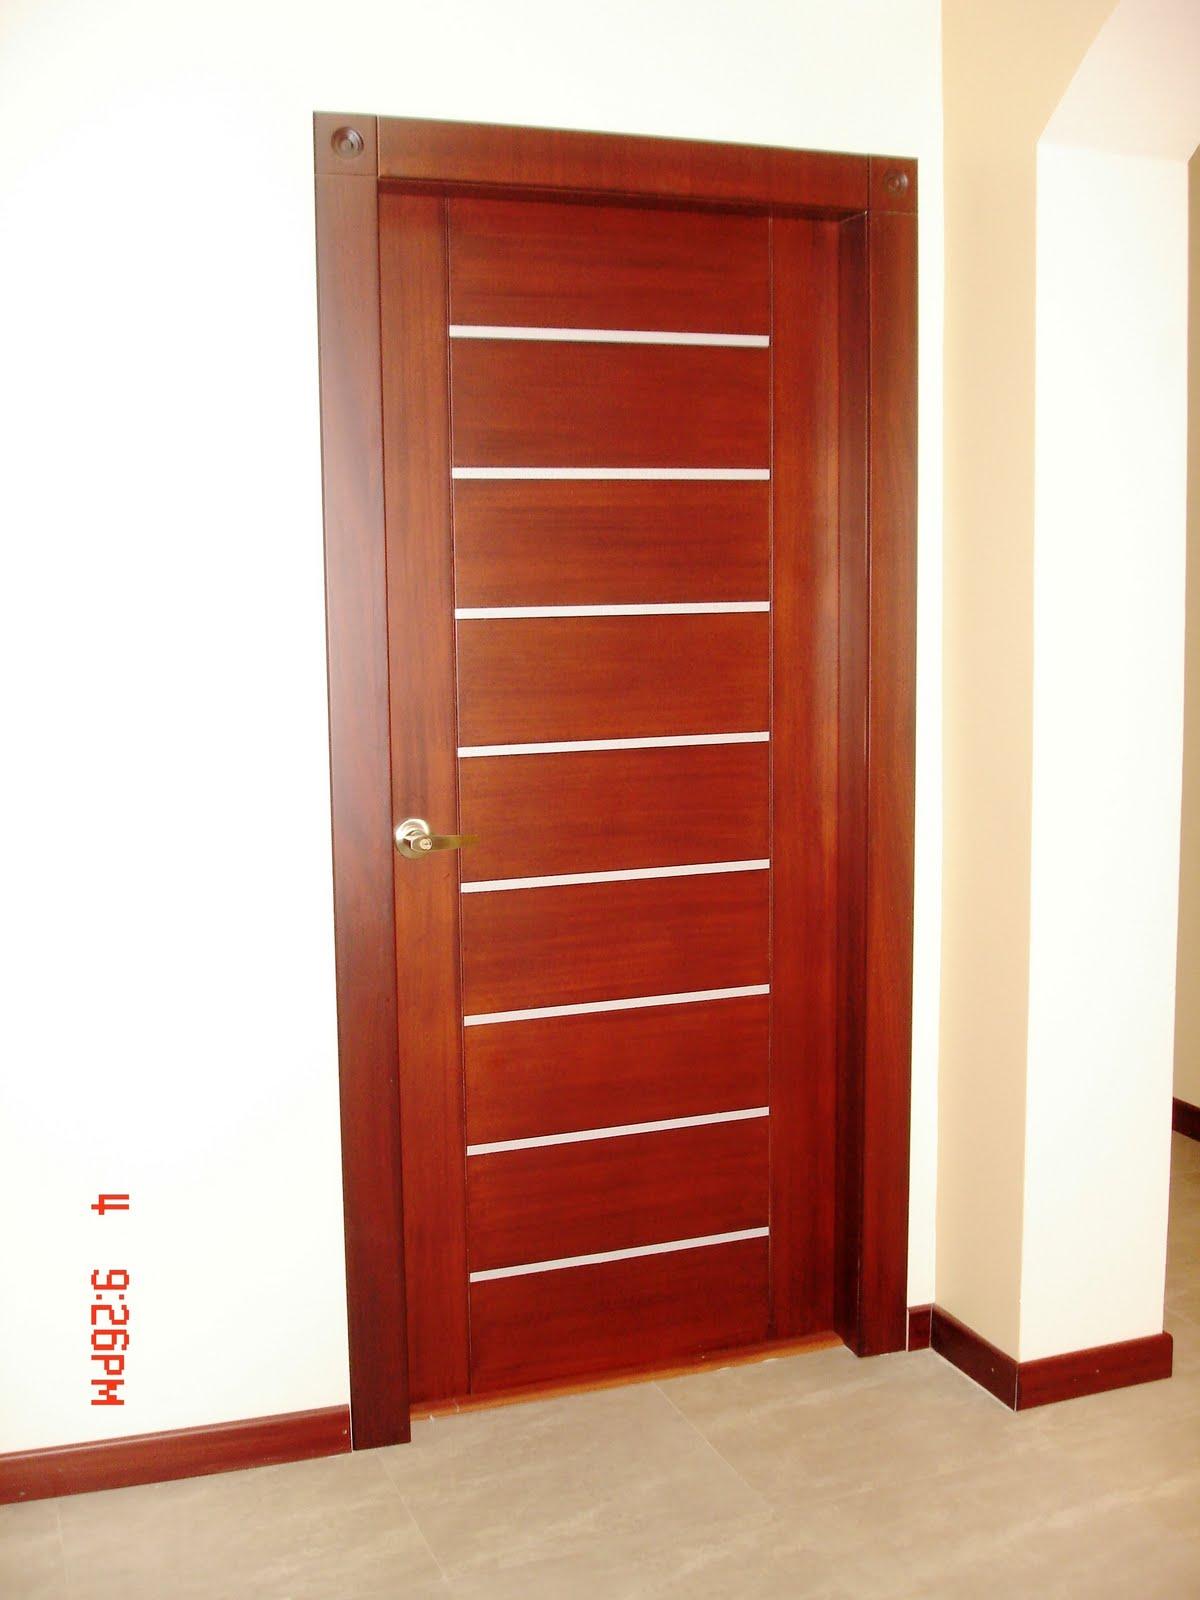 Puertas de aluminio para ba o color madera for Puertas de dormitorios en madera